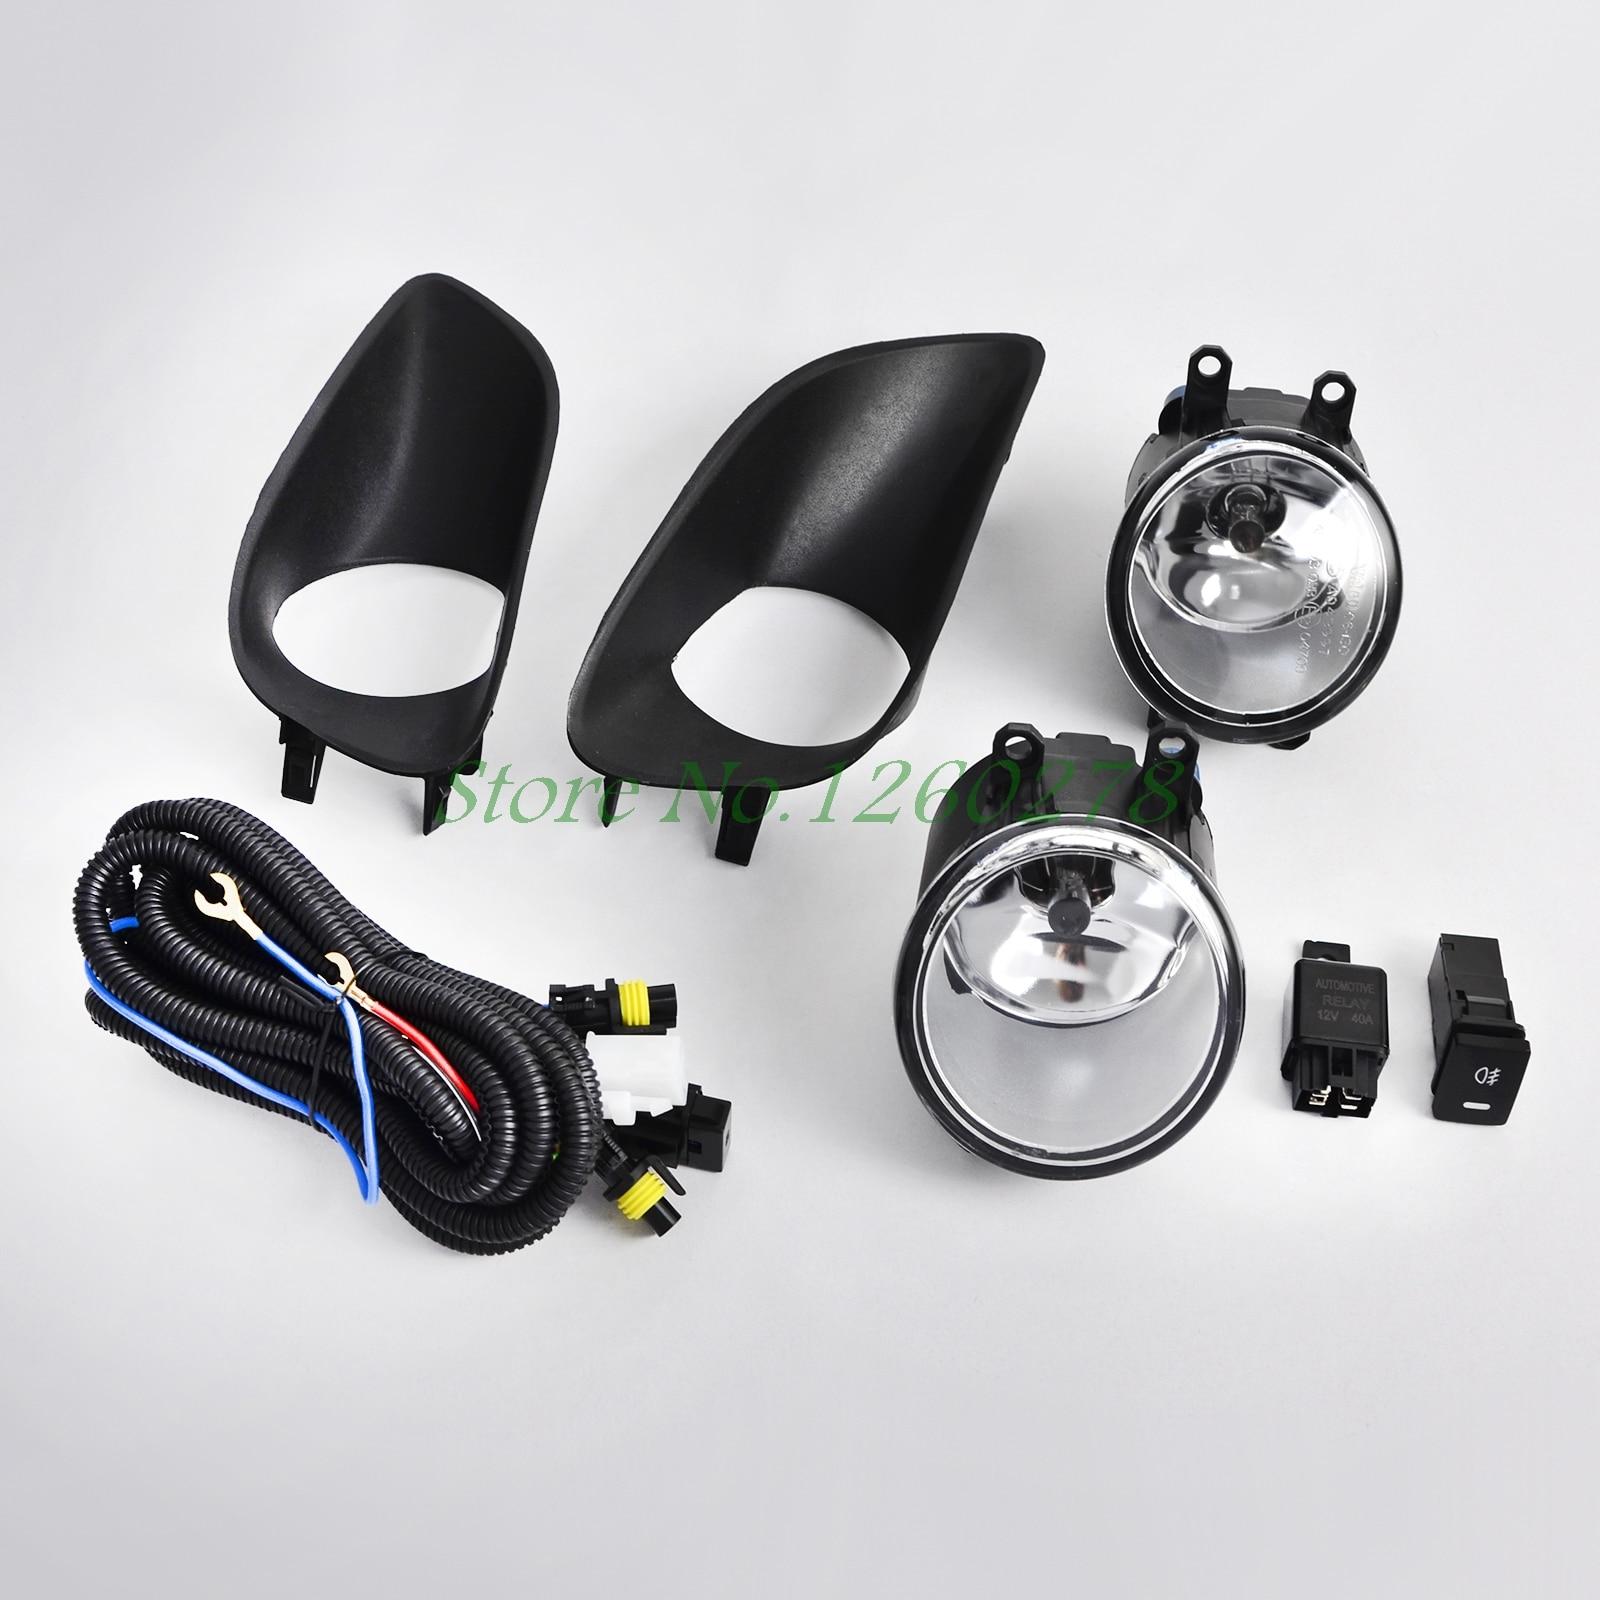 цена на One Pair Auto Car Front Bumper Fog Light Clear w/ Switch For Toyota Yaris 2006-2011 Sedan 4 Door #WJ30-0074-09